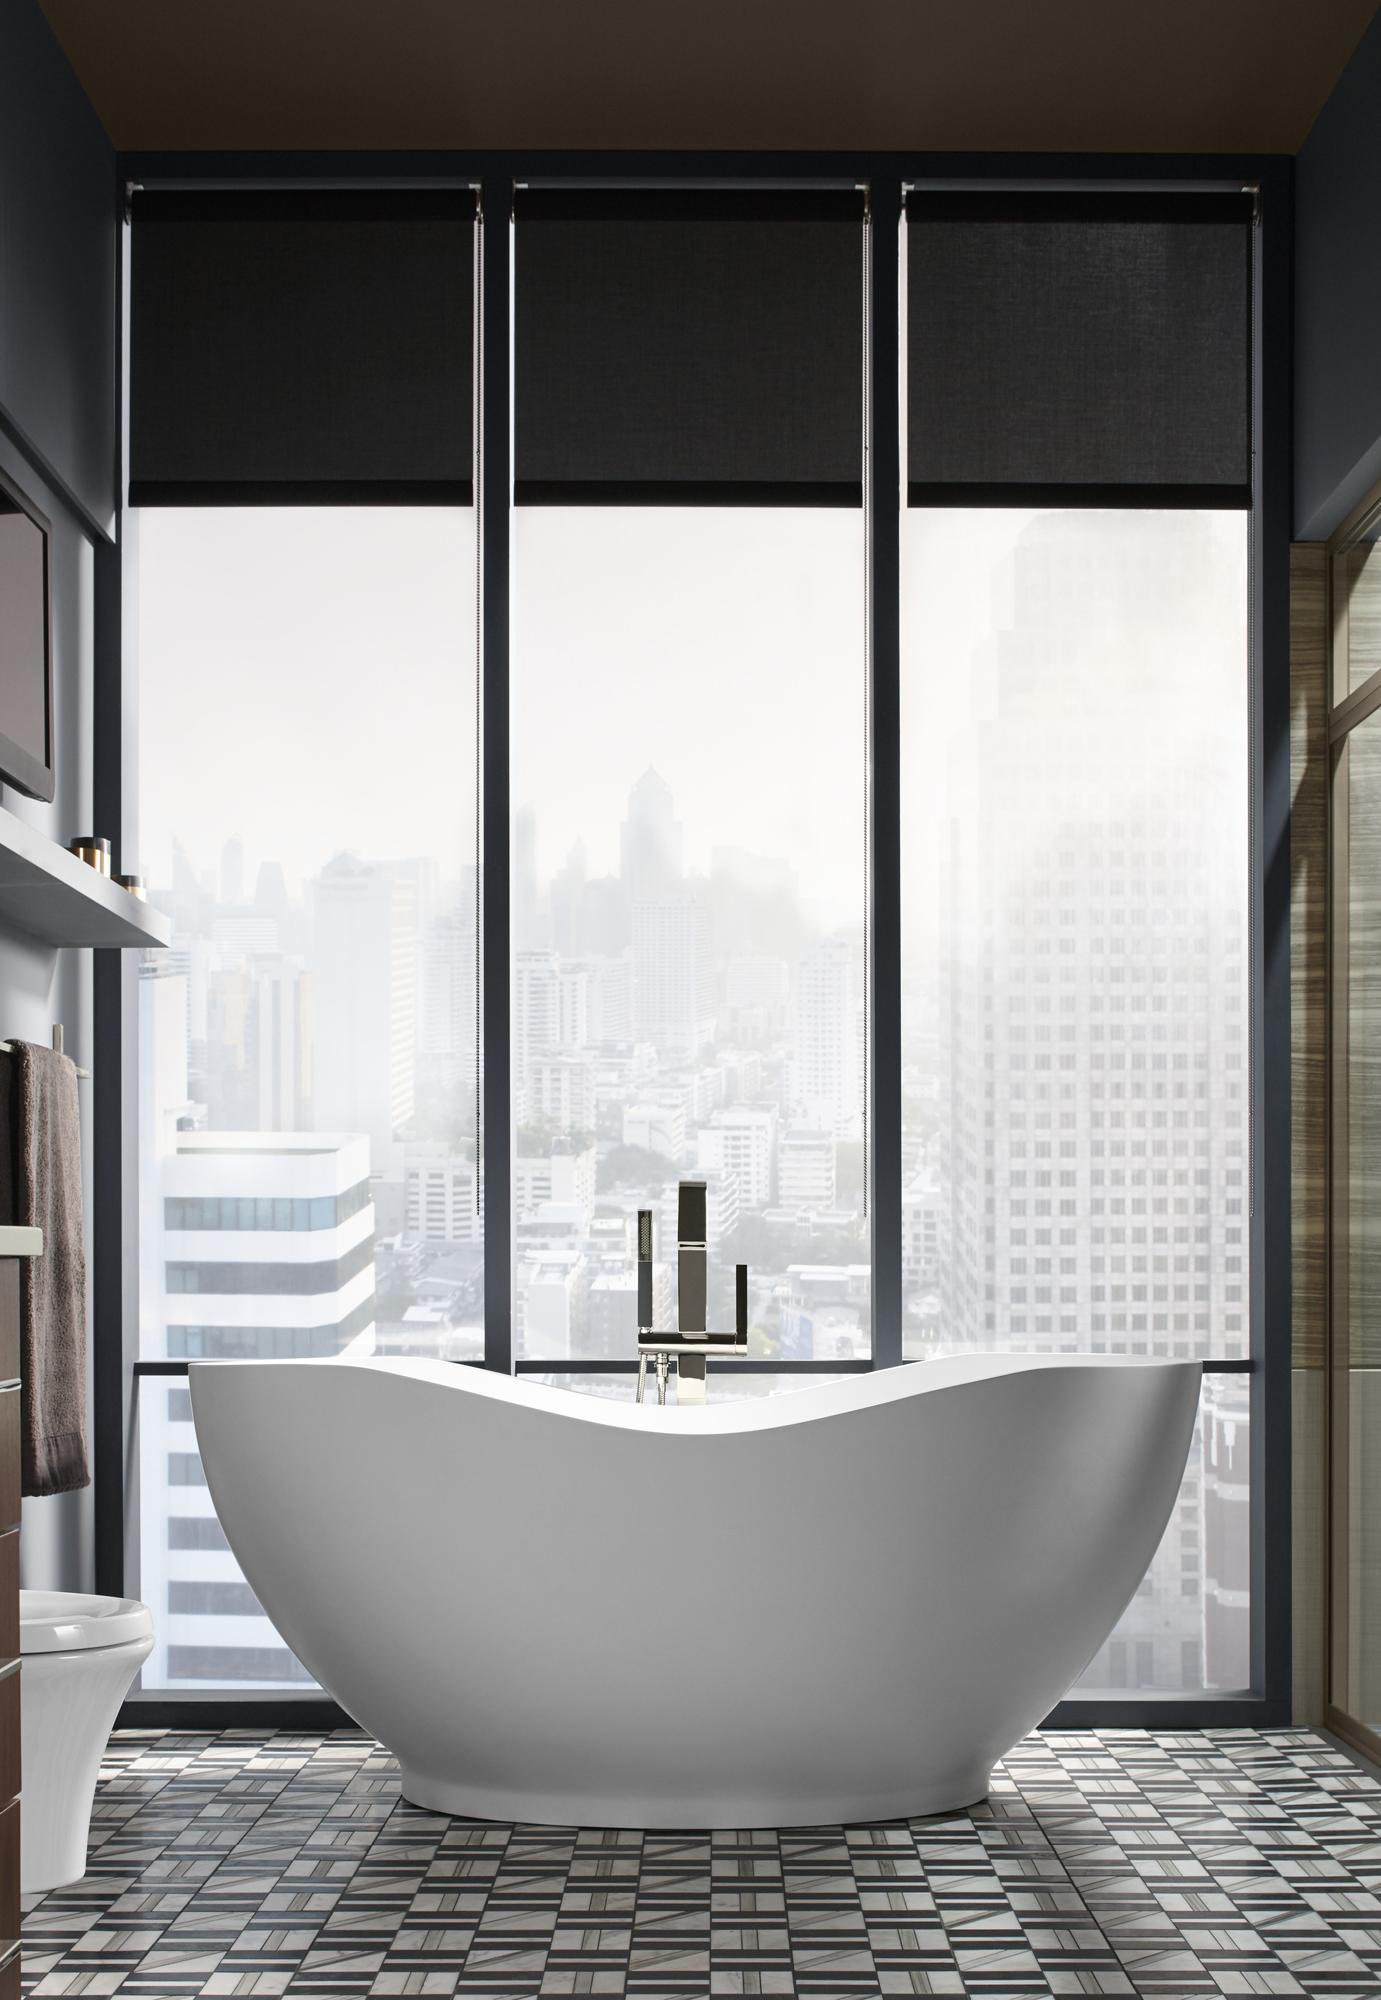 Abrazo® bath   Loure® bath filler     This bath's teacup design introduces clean, organic curves into a modern space.